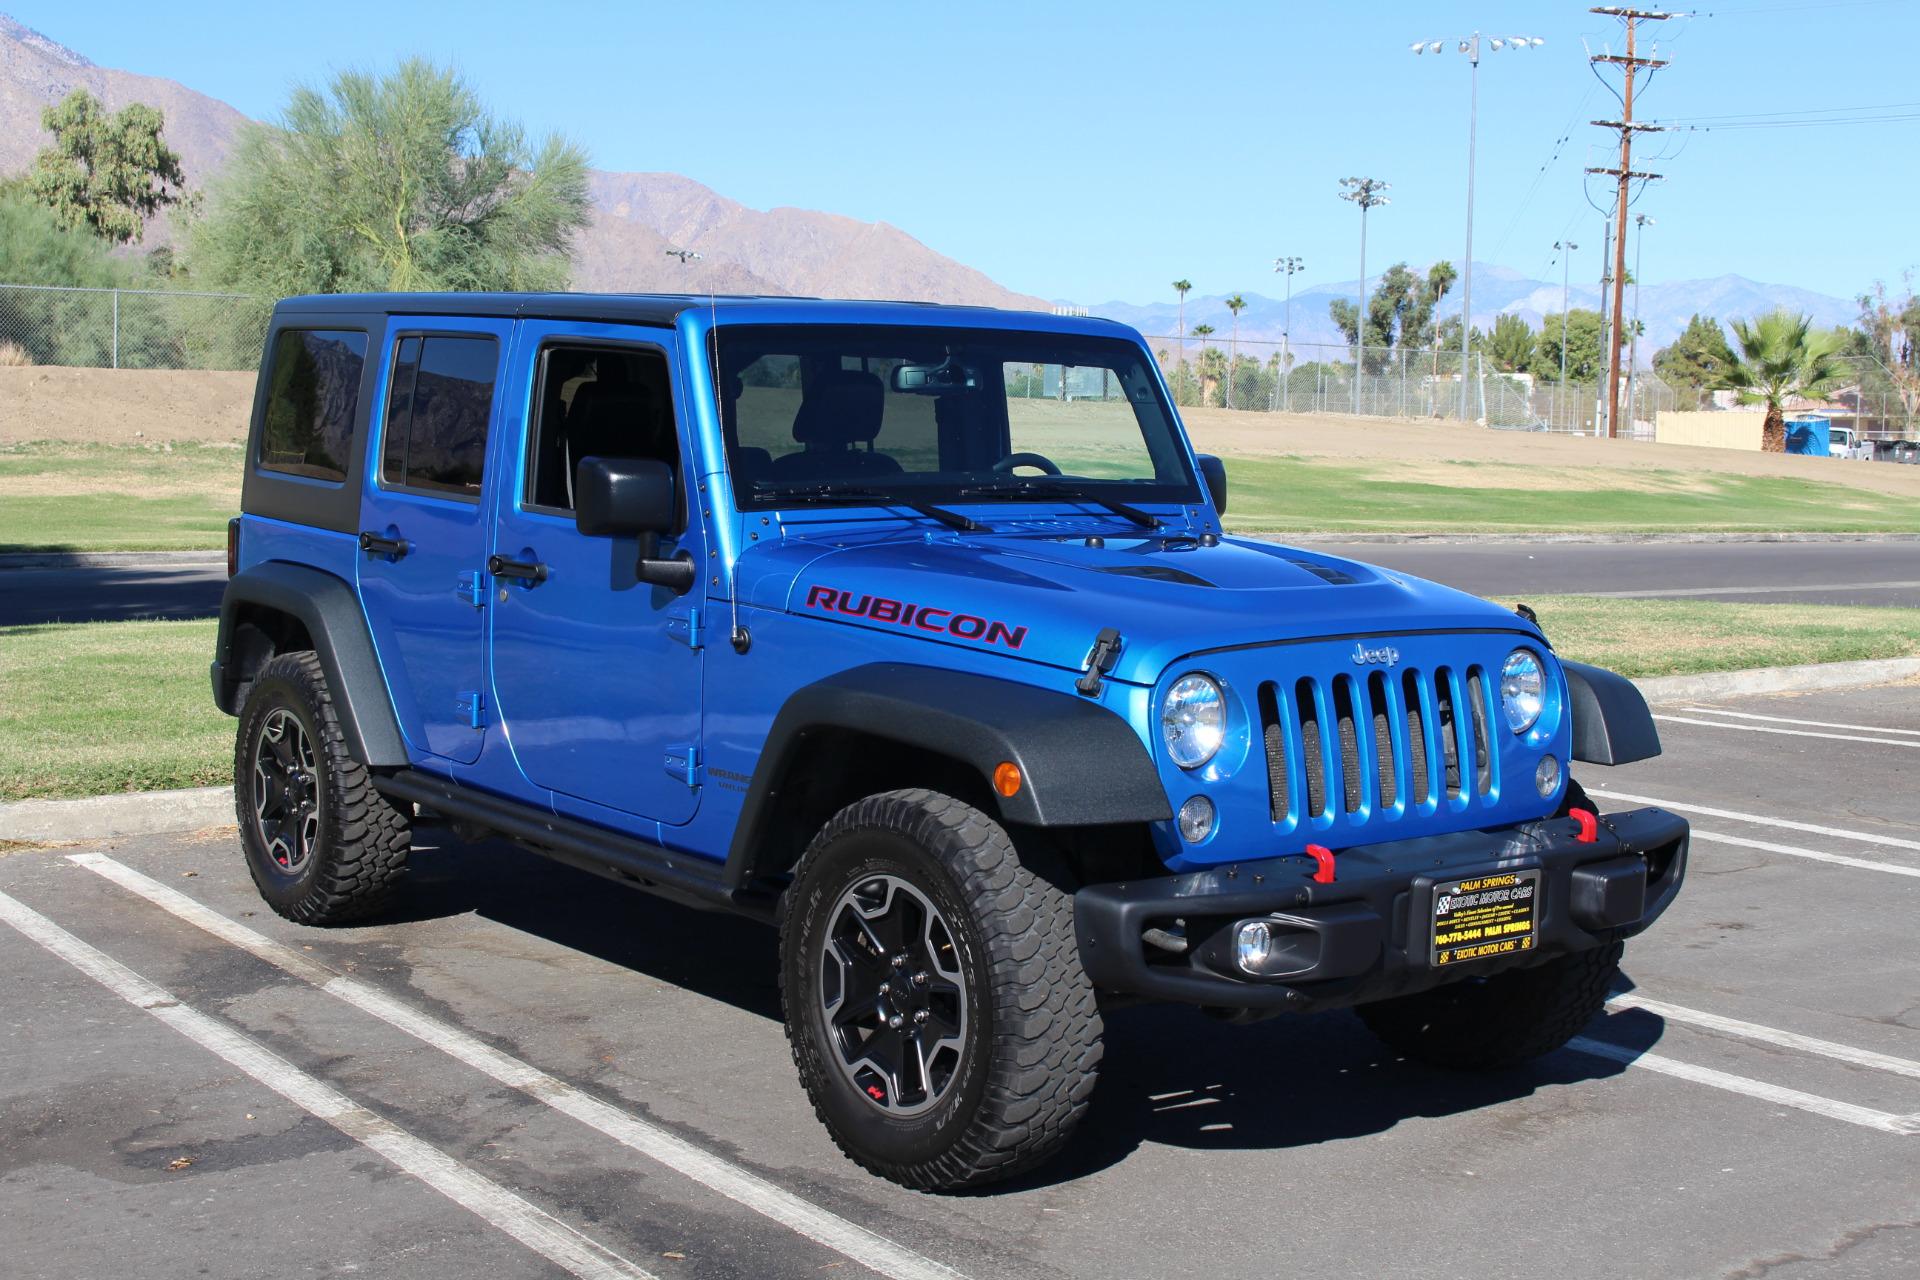 2015 Jeep Wrangler Unlimited Rubicon Hard Rock Stock